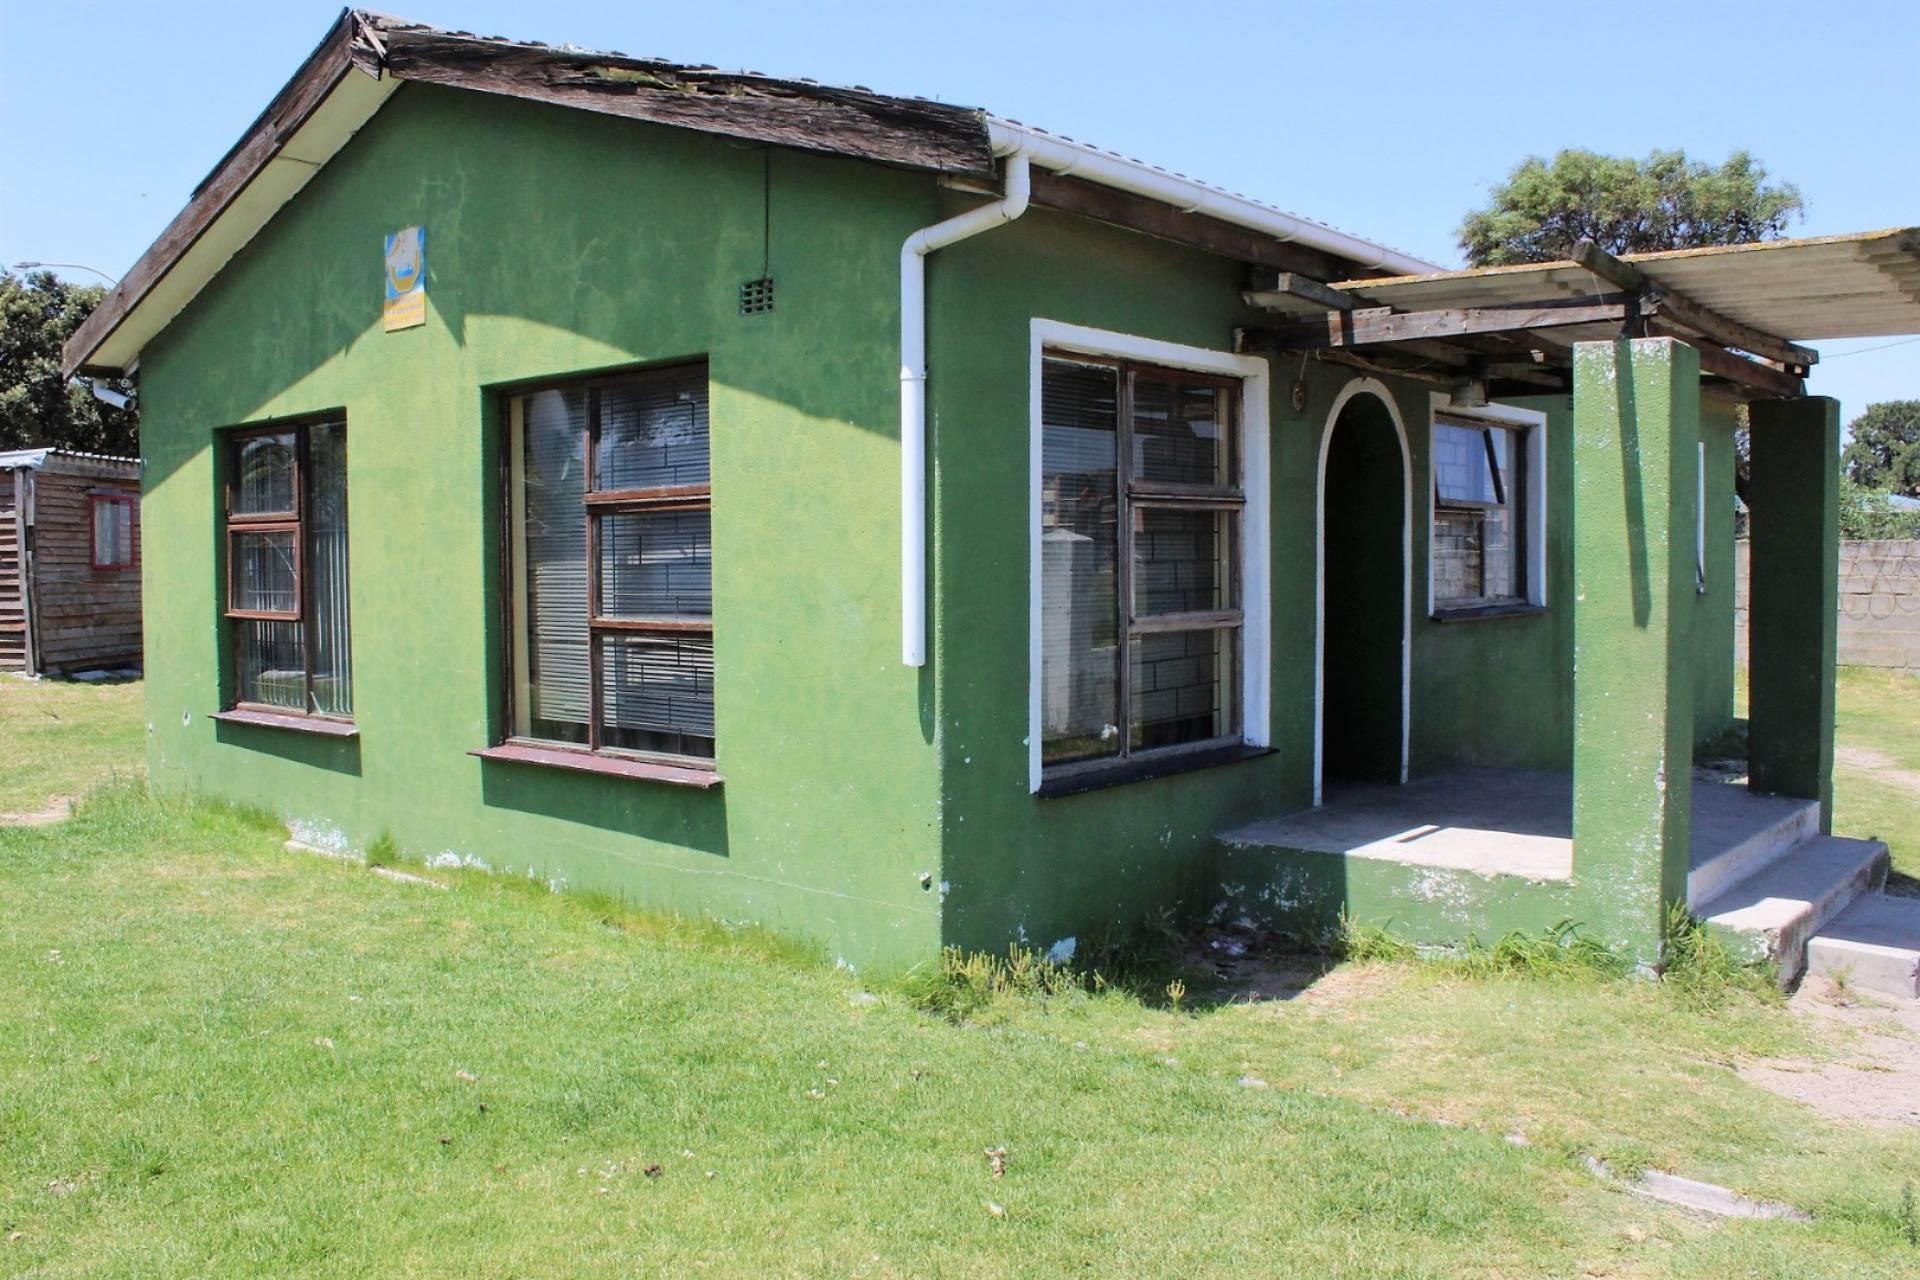 2 BedroomHouse Pending Sale In Avonwood